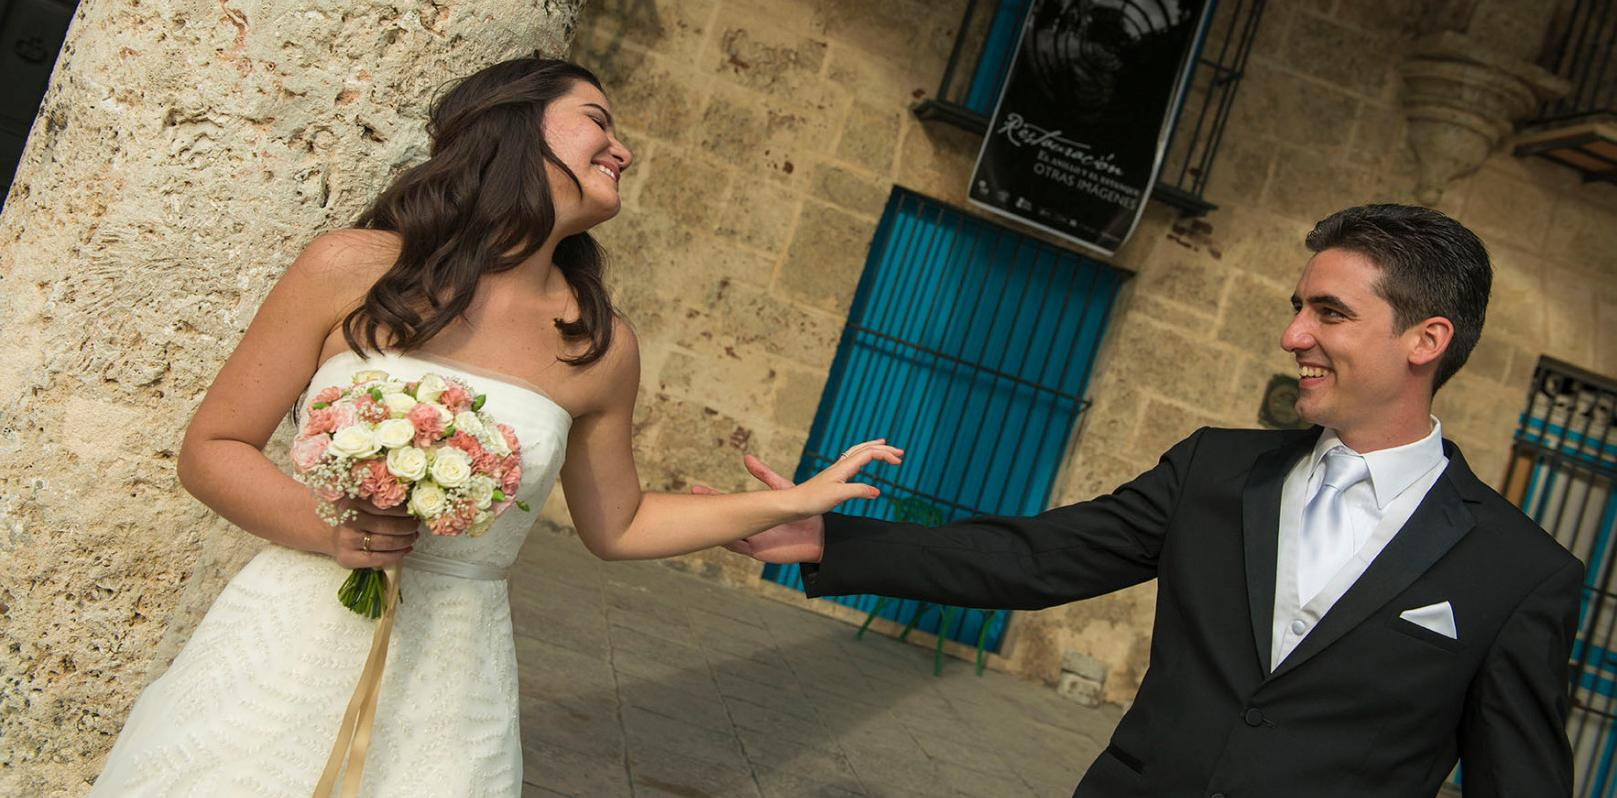 bodas-sin-clasificar-sin-tema-cuba-15512.jpg